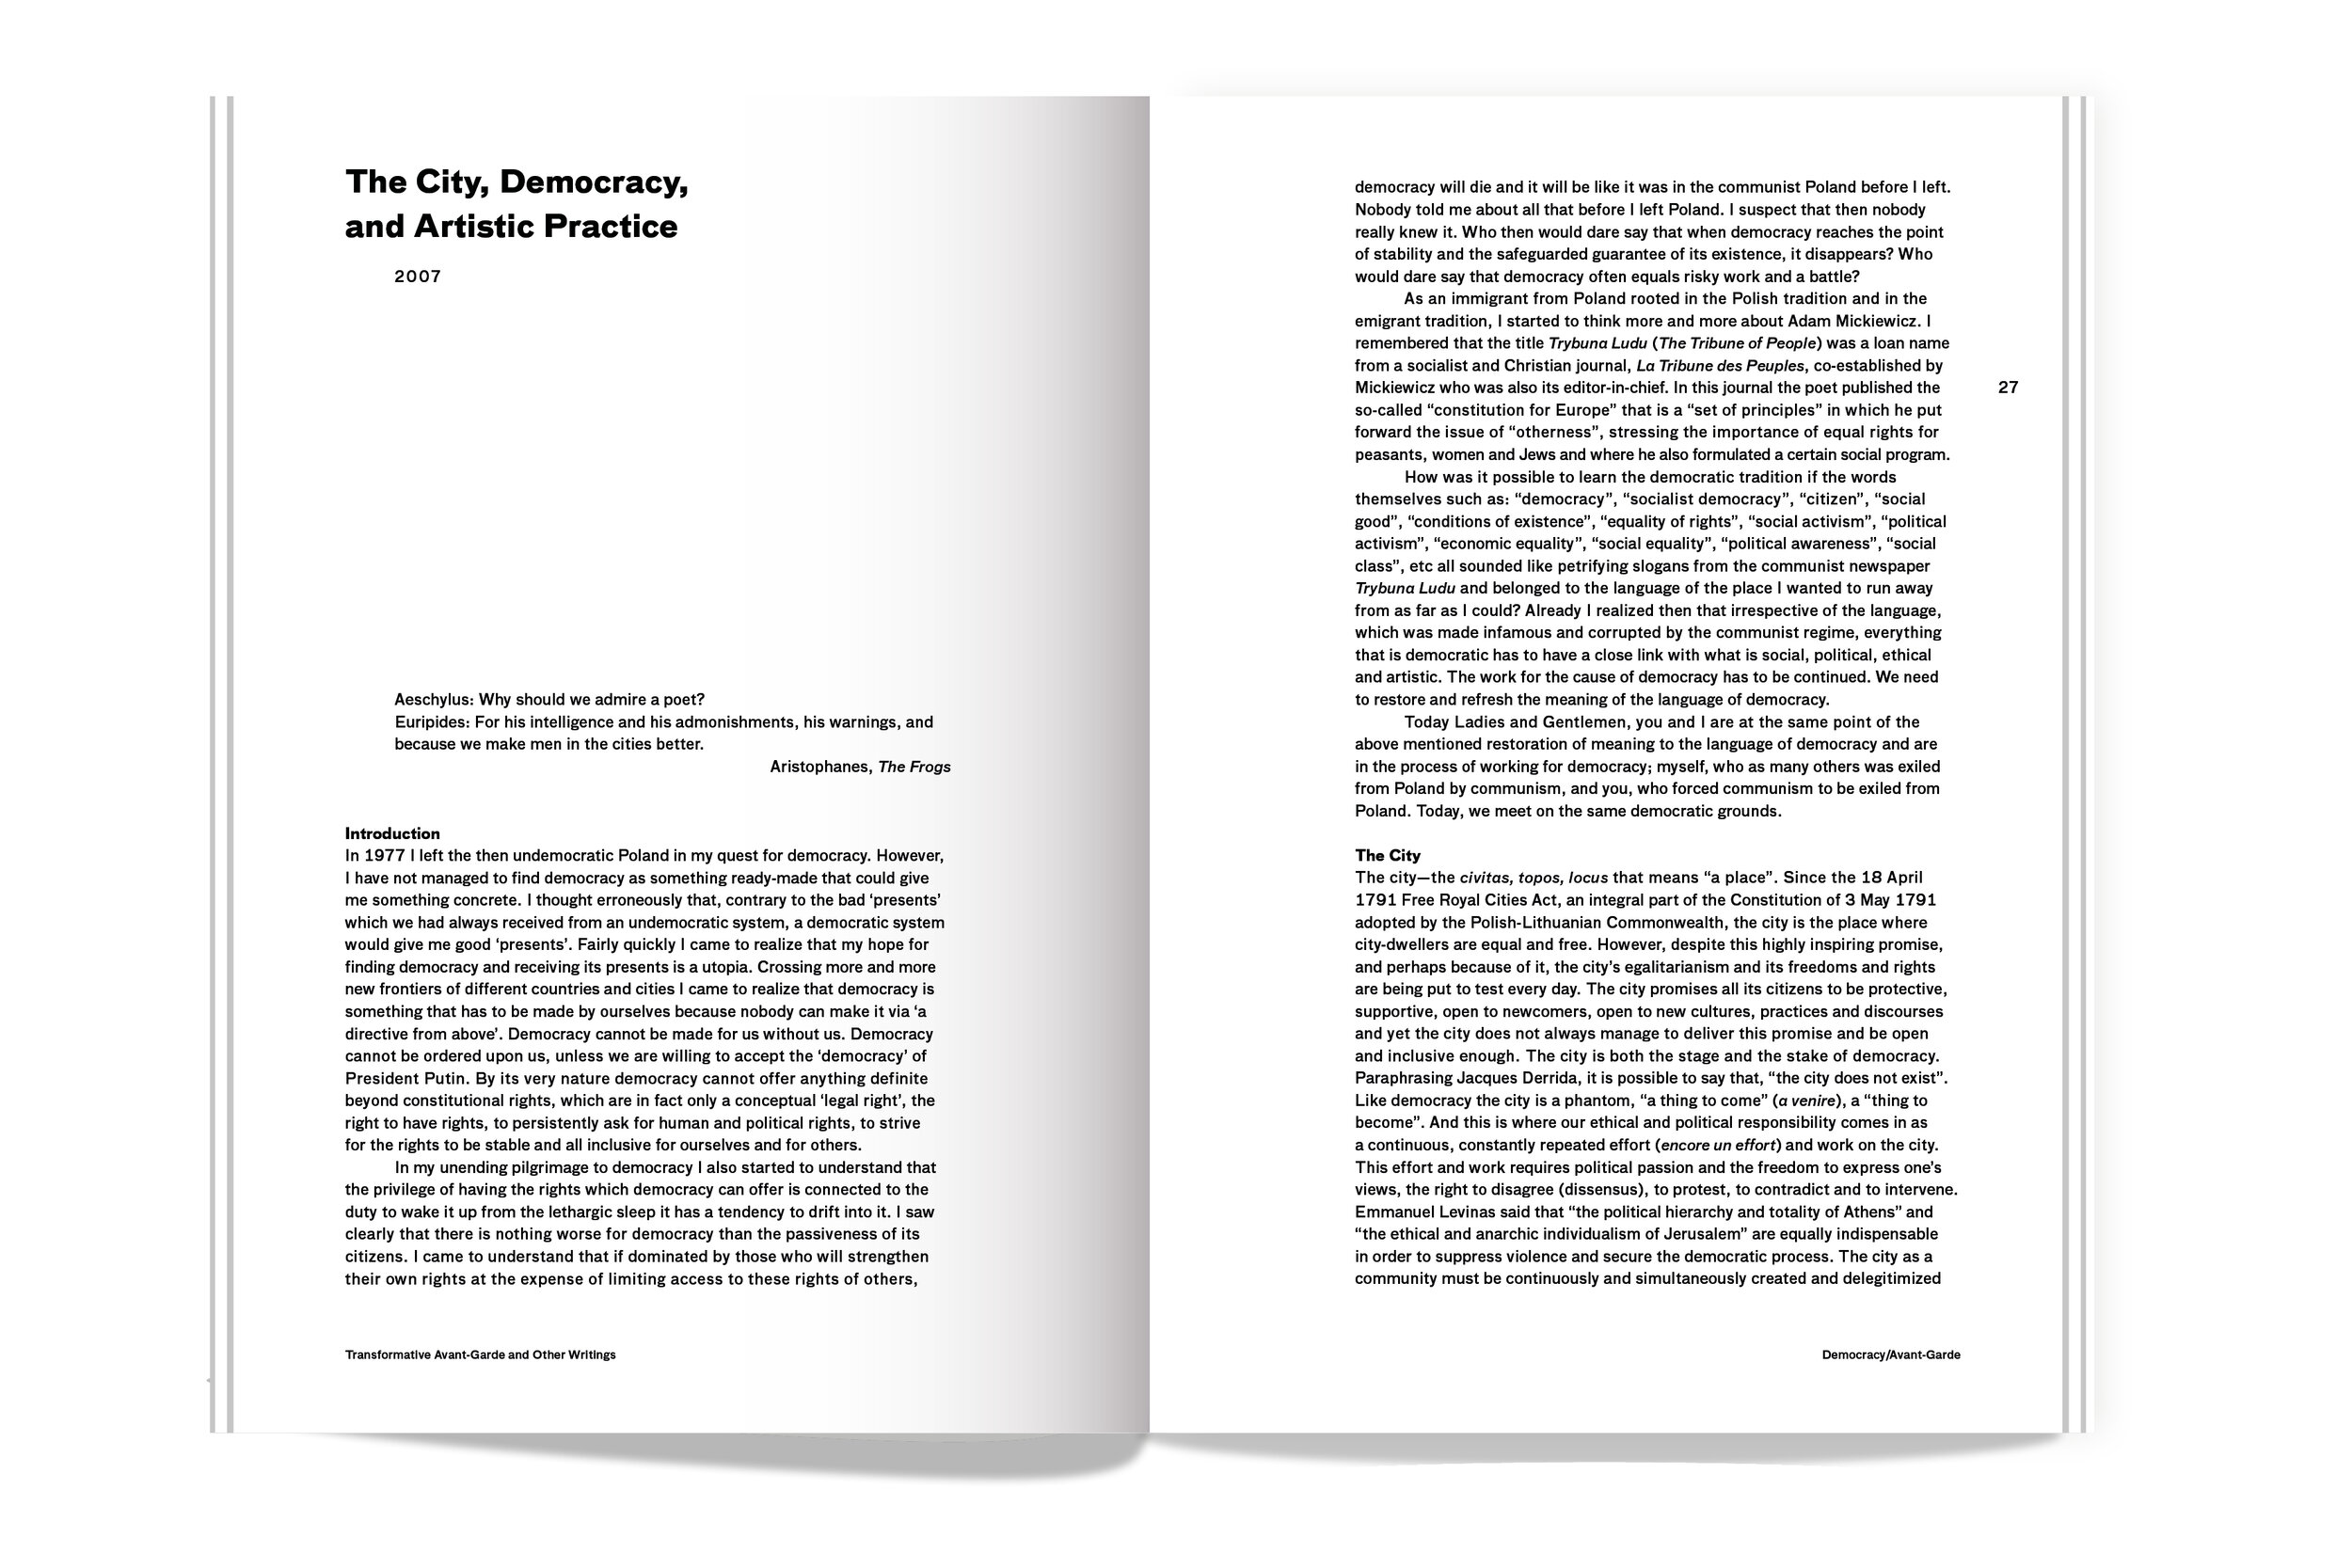 BDP_Transformative Avant-Garde & Other Writings_Inners_V2-002.jpg